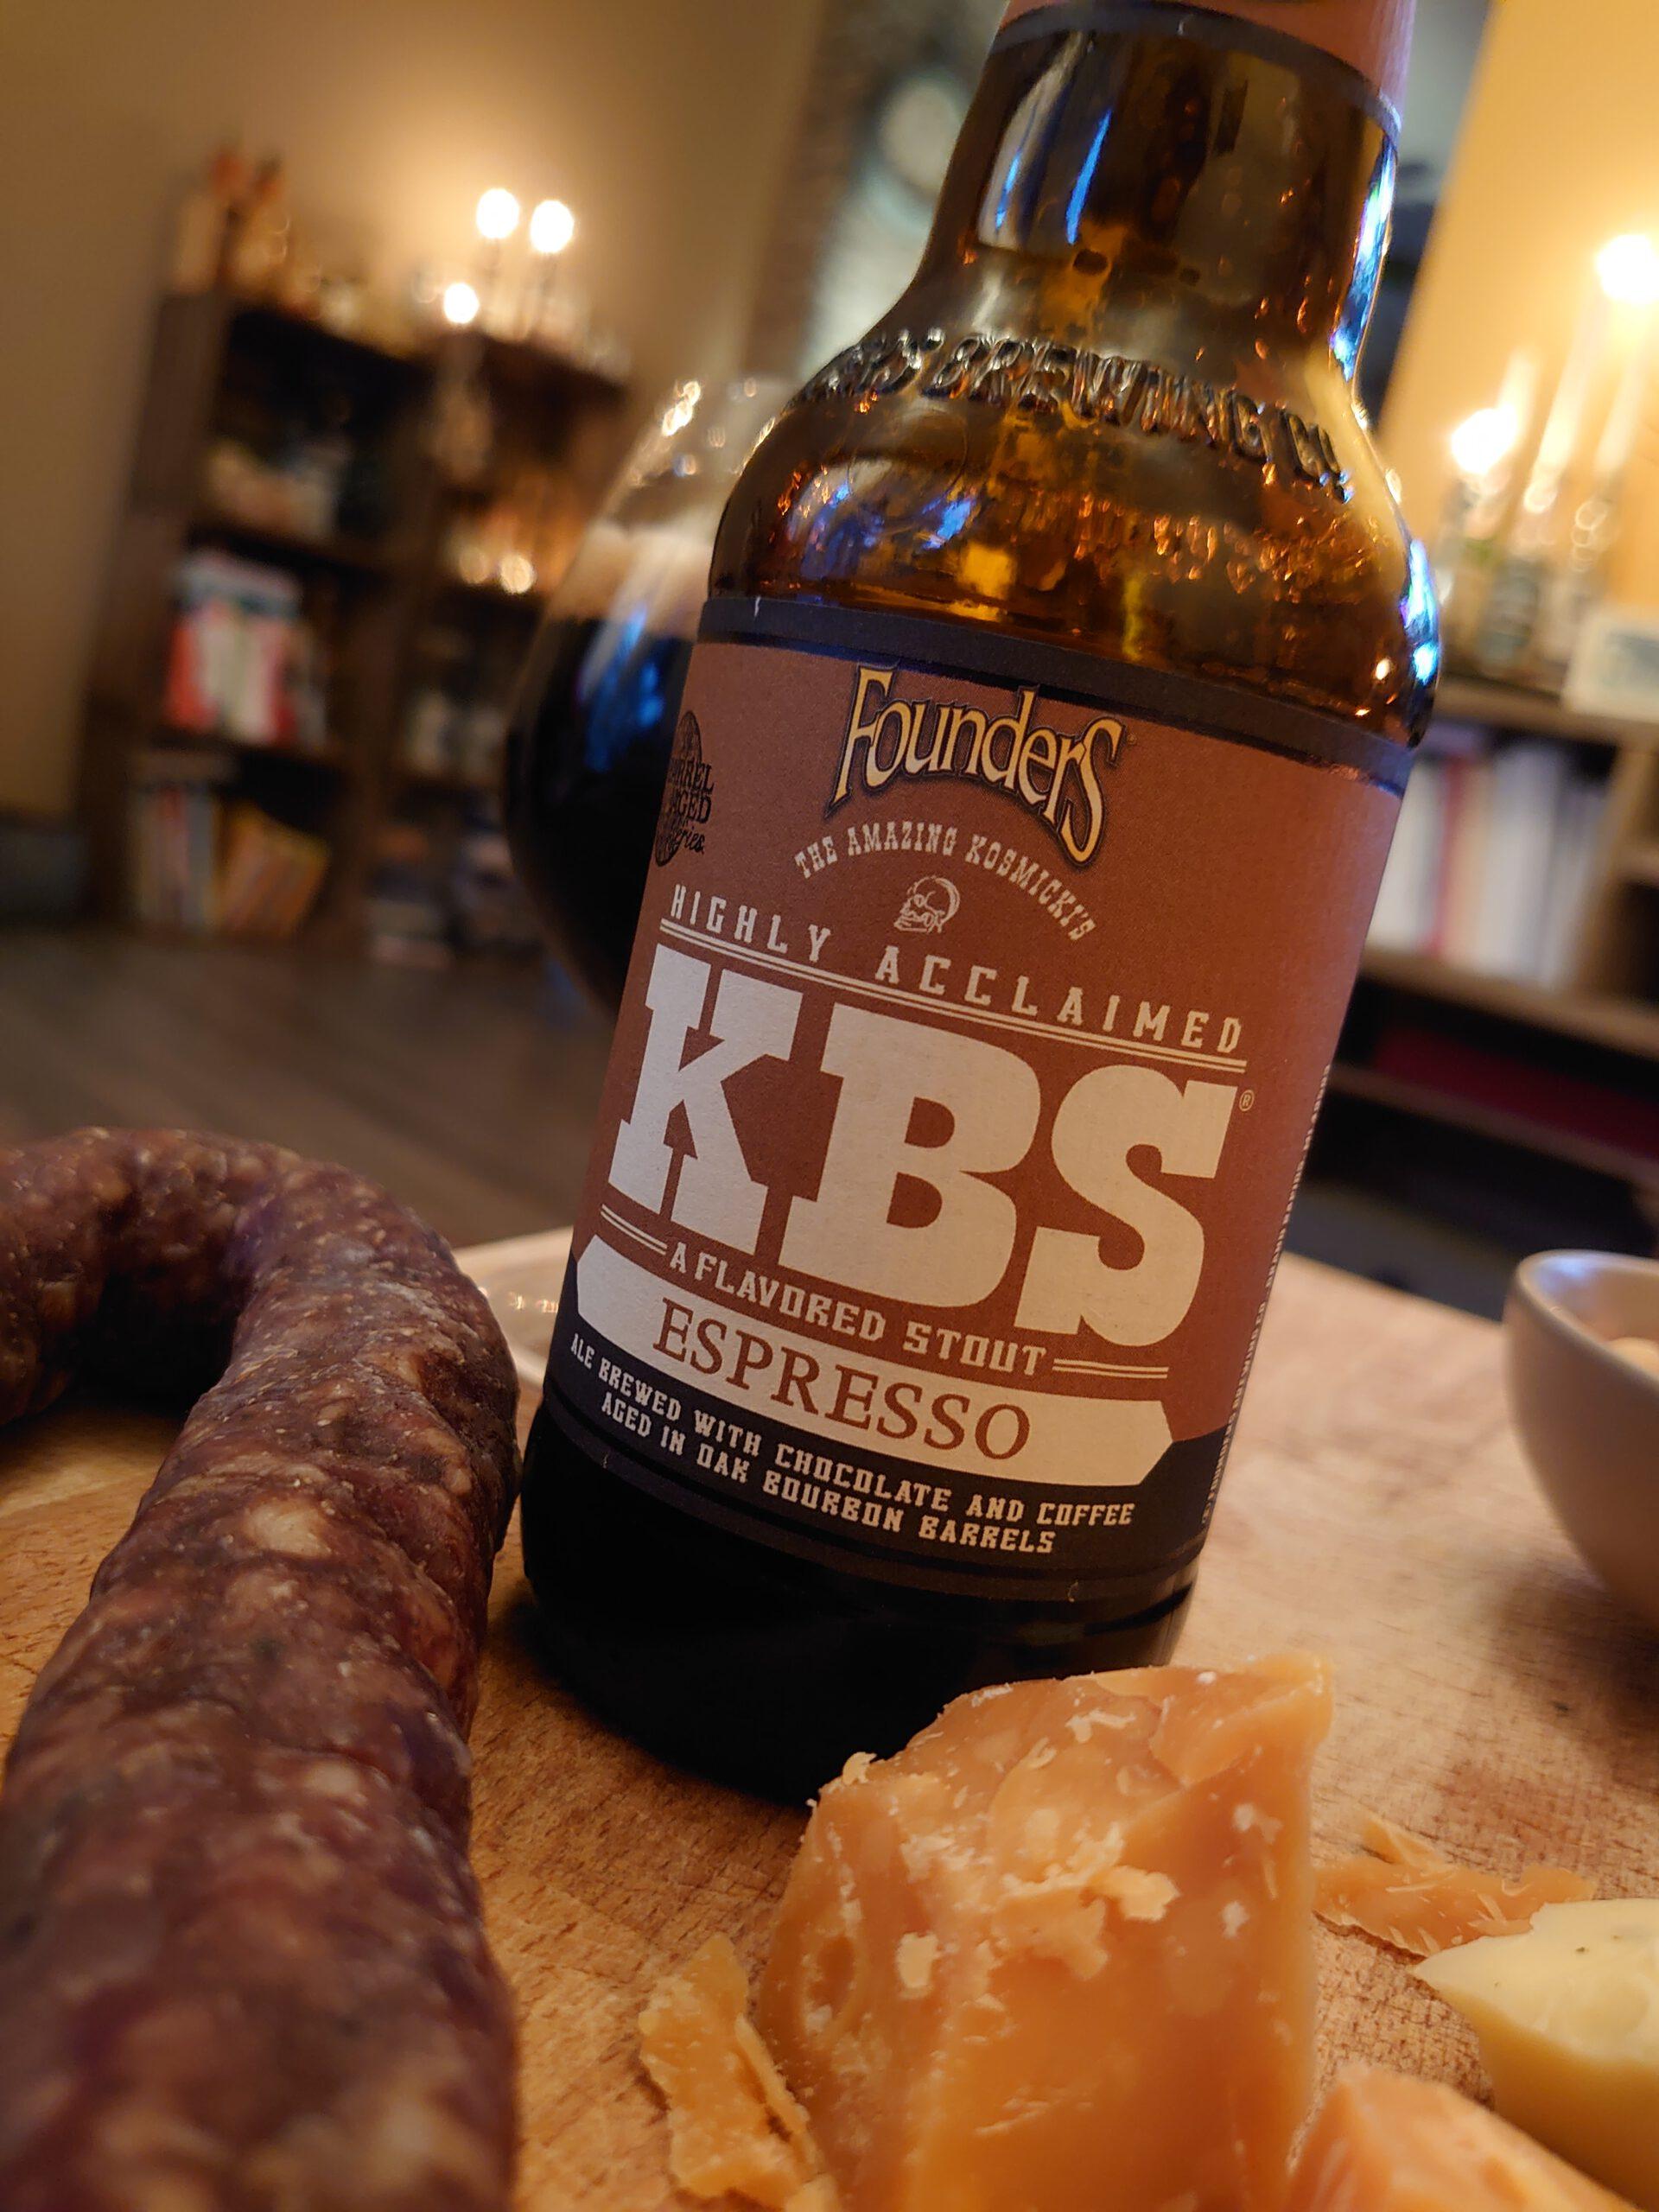 KBS Espresso Stout van Founders Brewing